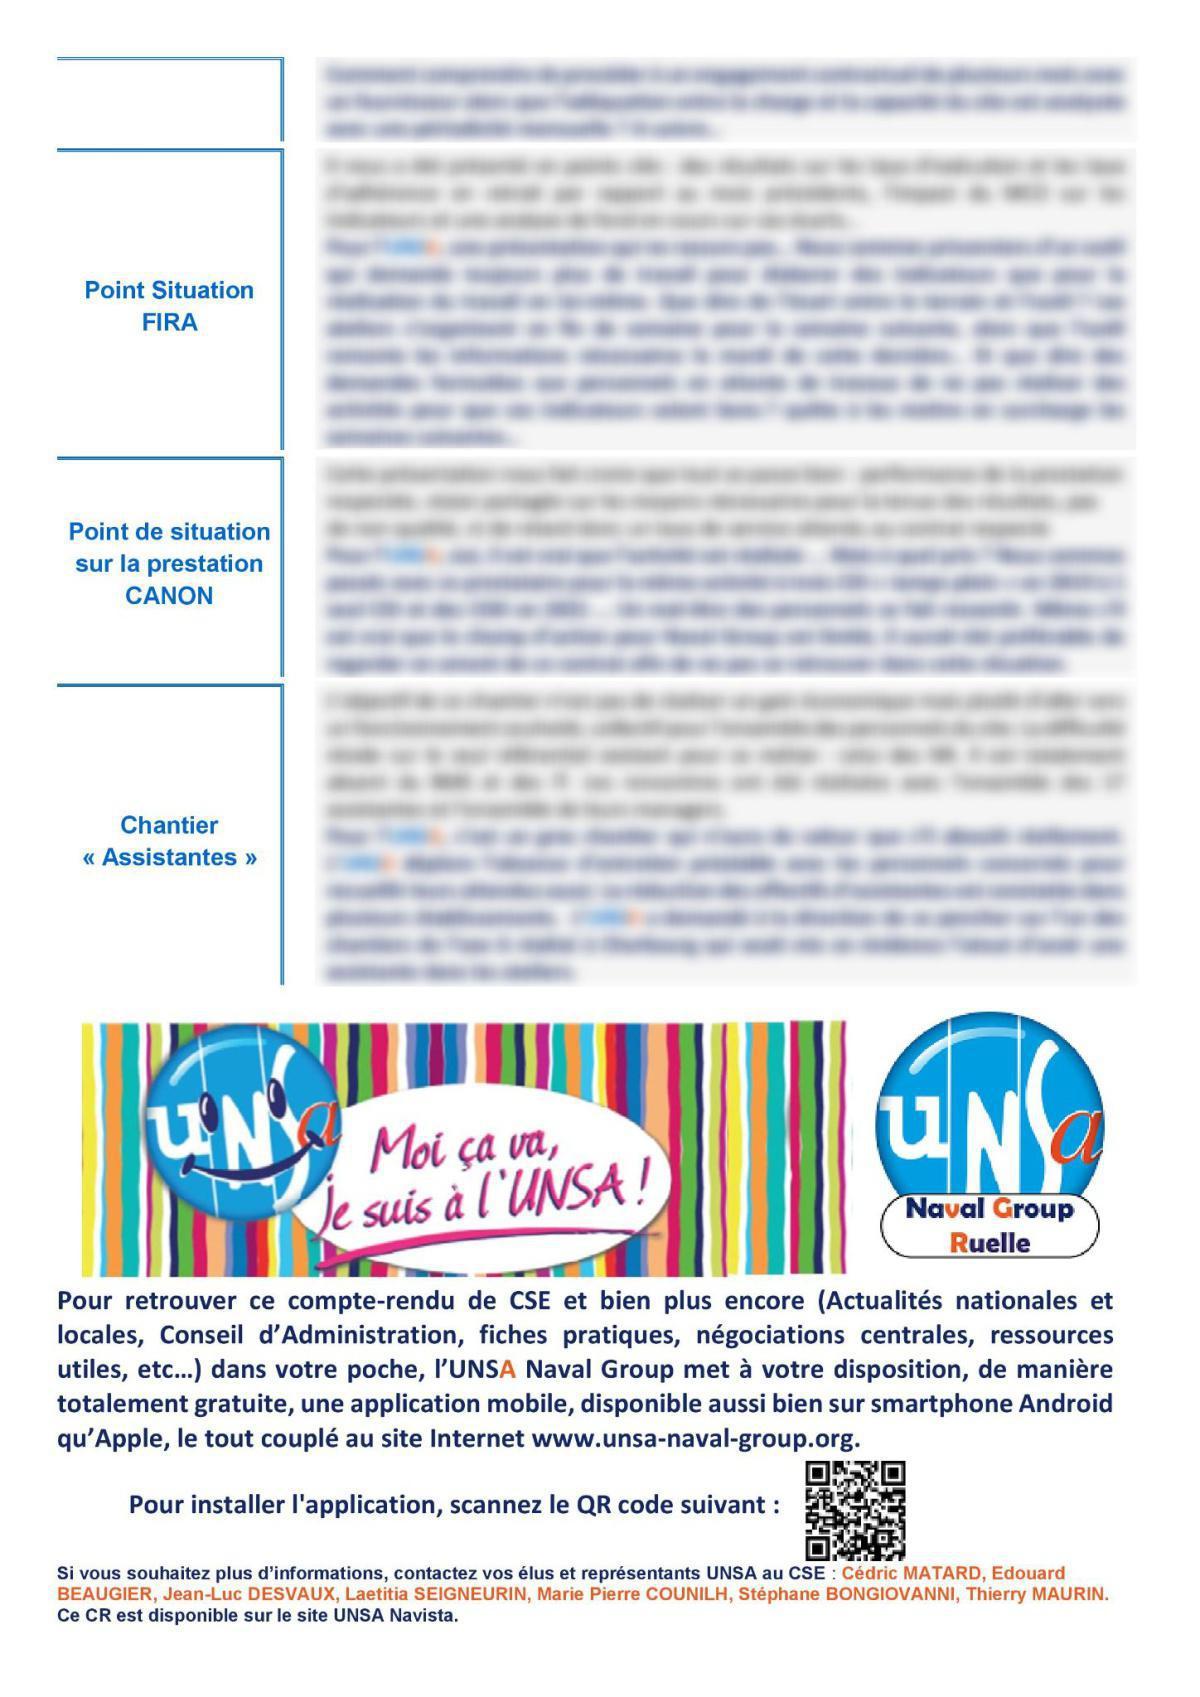 CSE de Ruelle - Réunion du 8 juin 2021 - Compte rendu